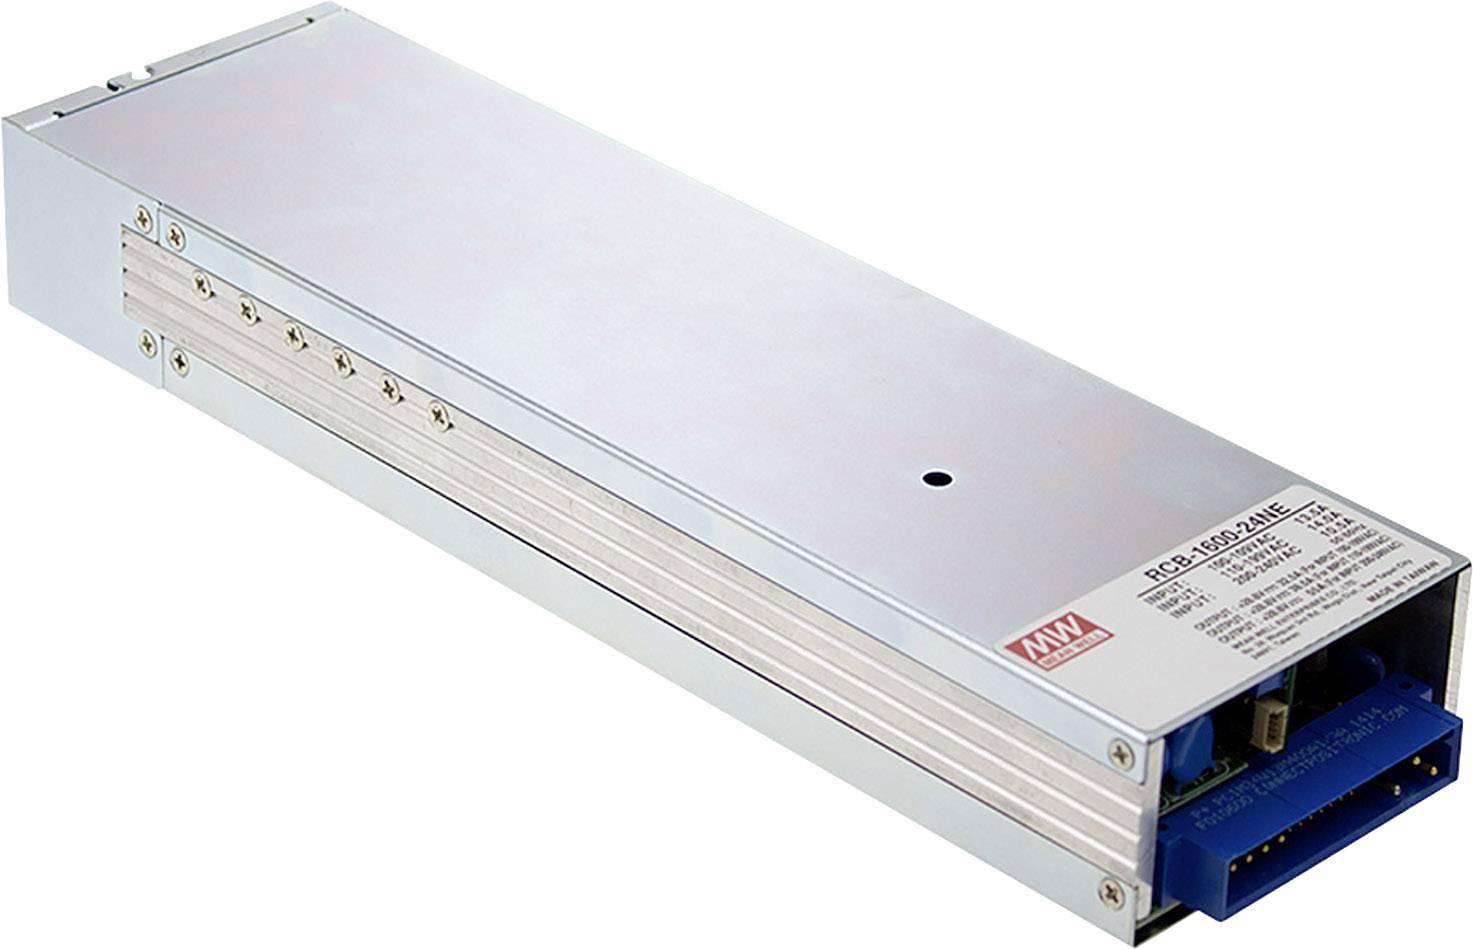 Mean Well Bleiakku Ladegerät RCB 1600 24 24 V Ladestrom (max.) 55 A